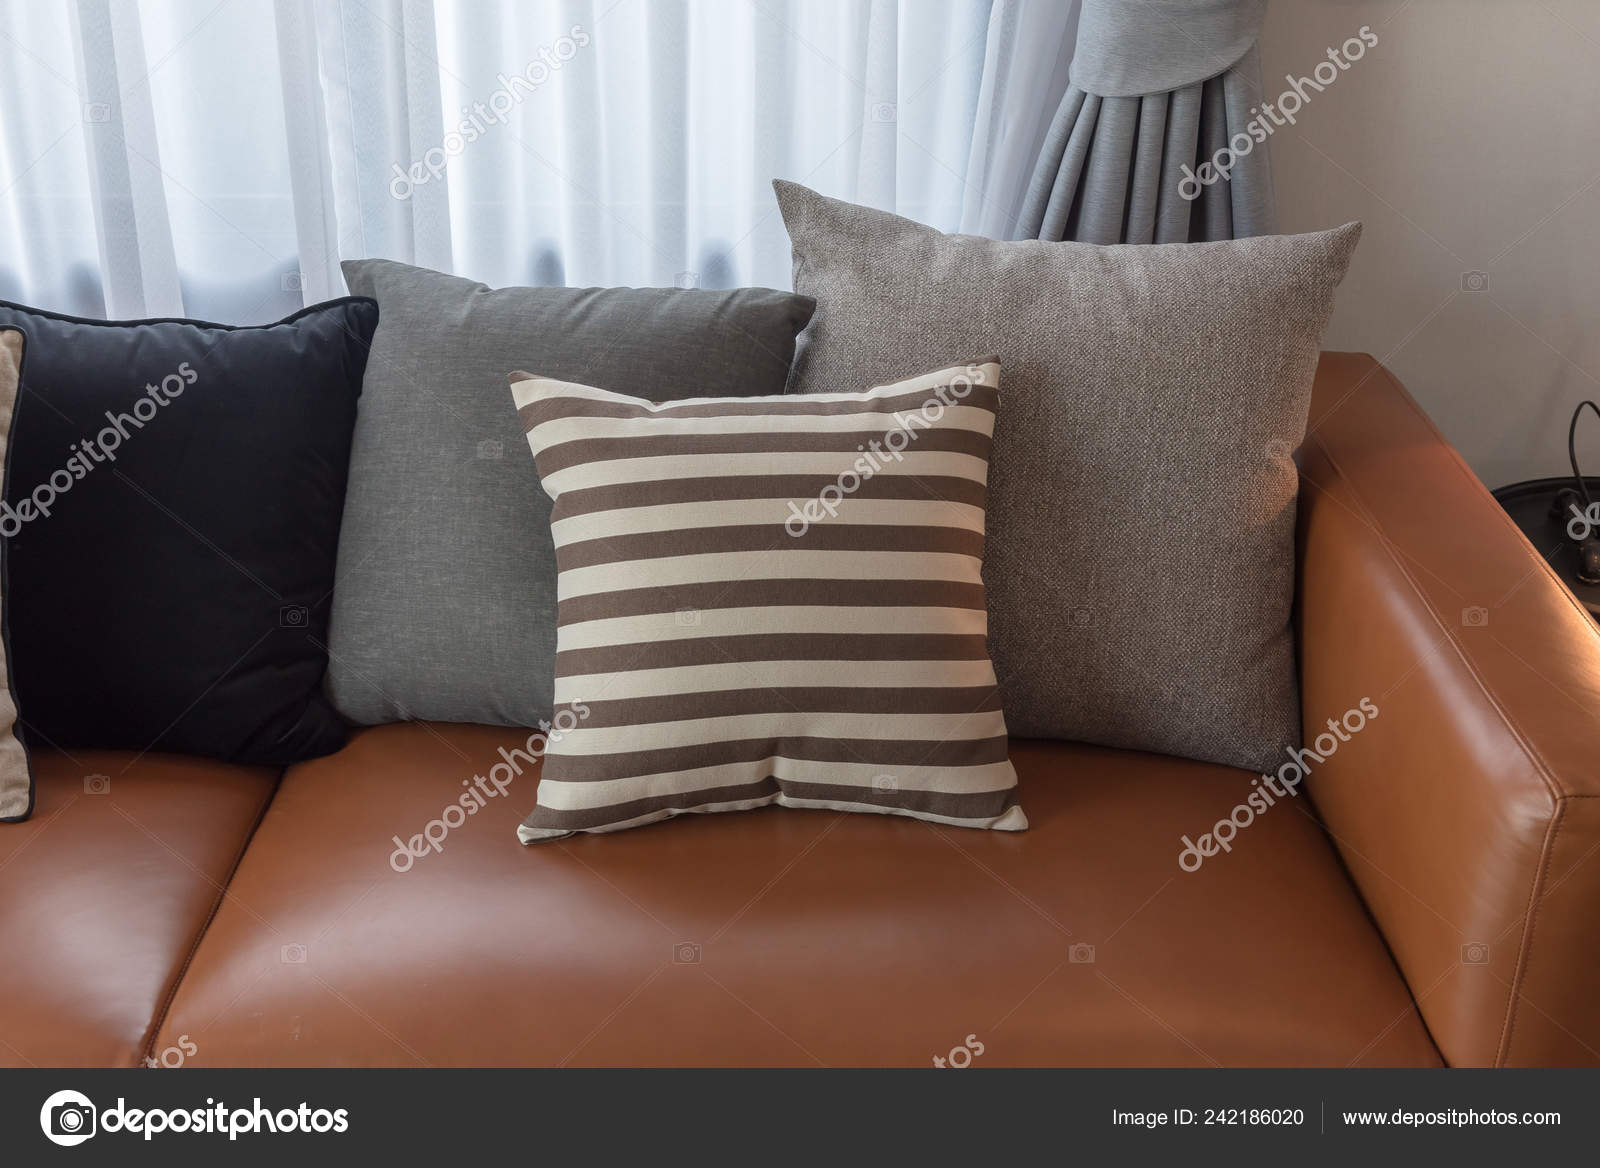 Modern Living Room Set Pillows Brown Sofa Interior Decoration Design Stock Photo C Khongkitwiriyachan 242186020